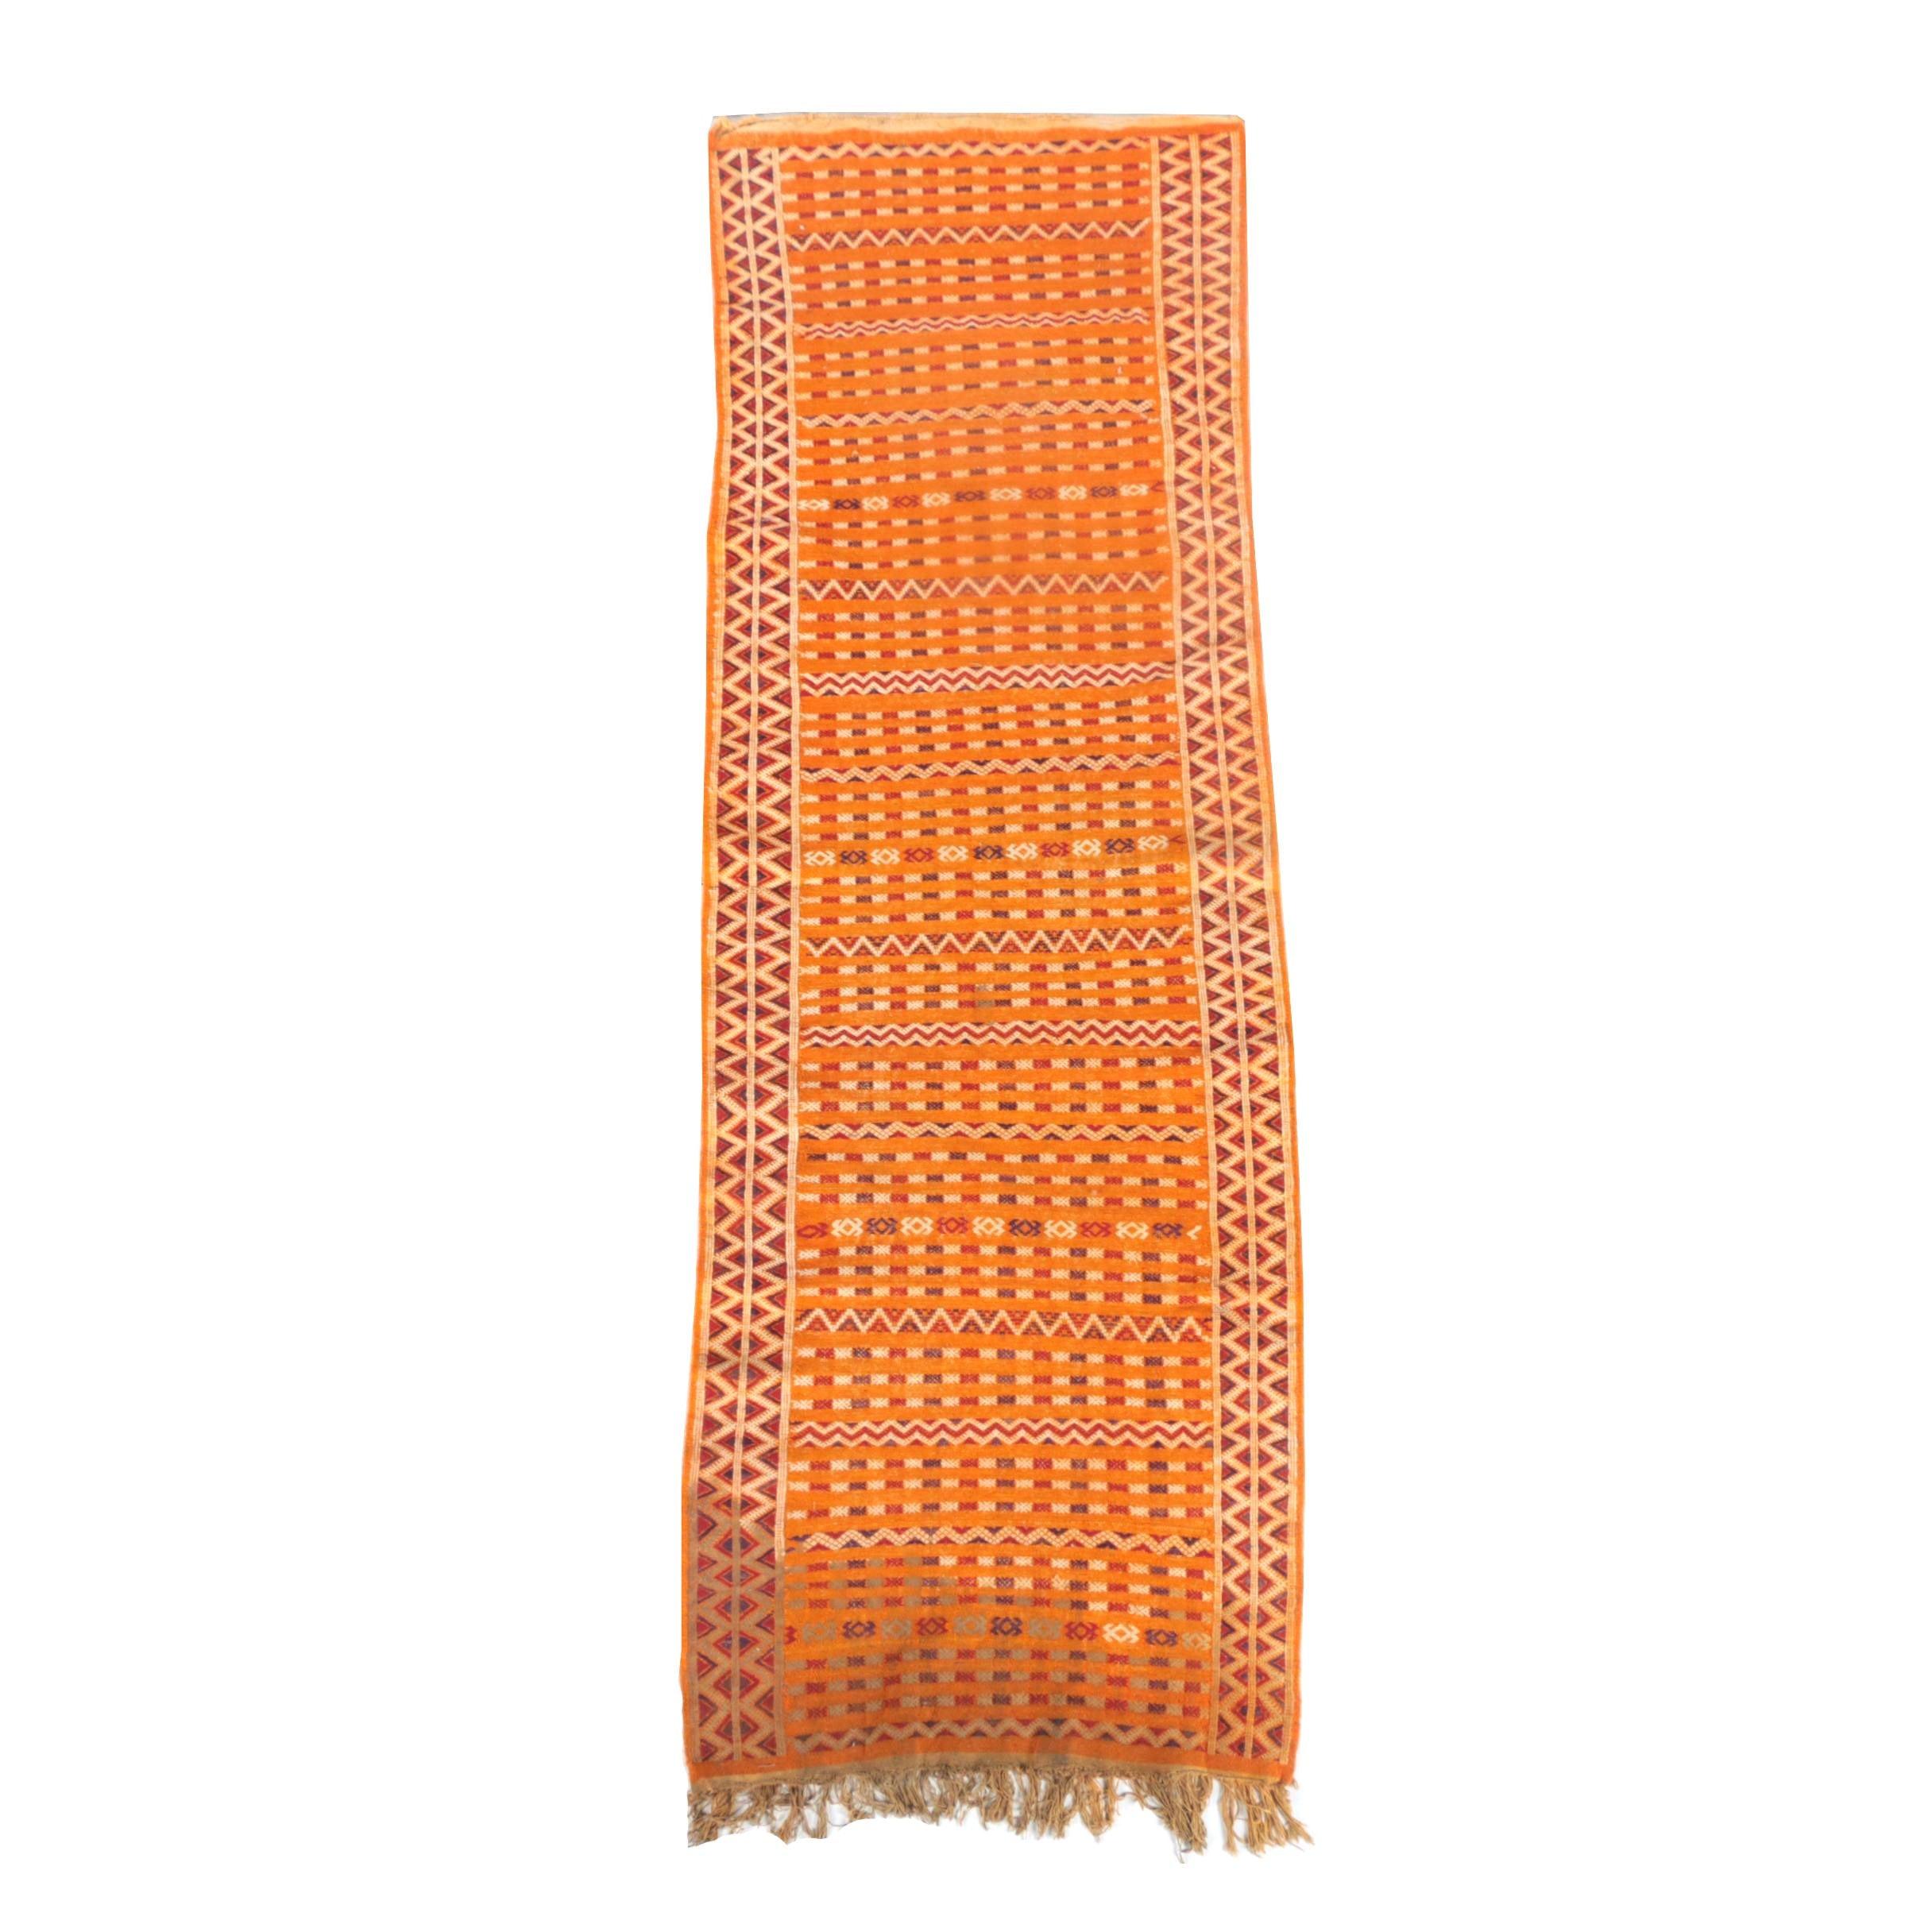 Handwoven Moroccan Zemmour Wool Kilim Runner